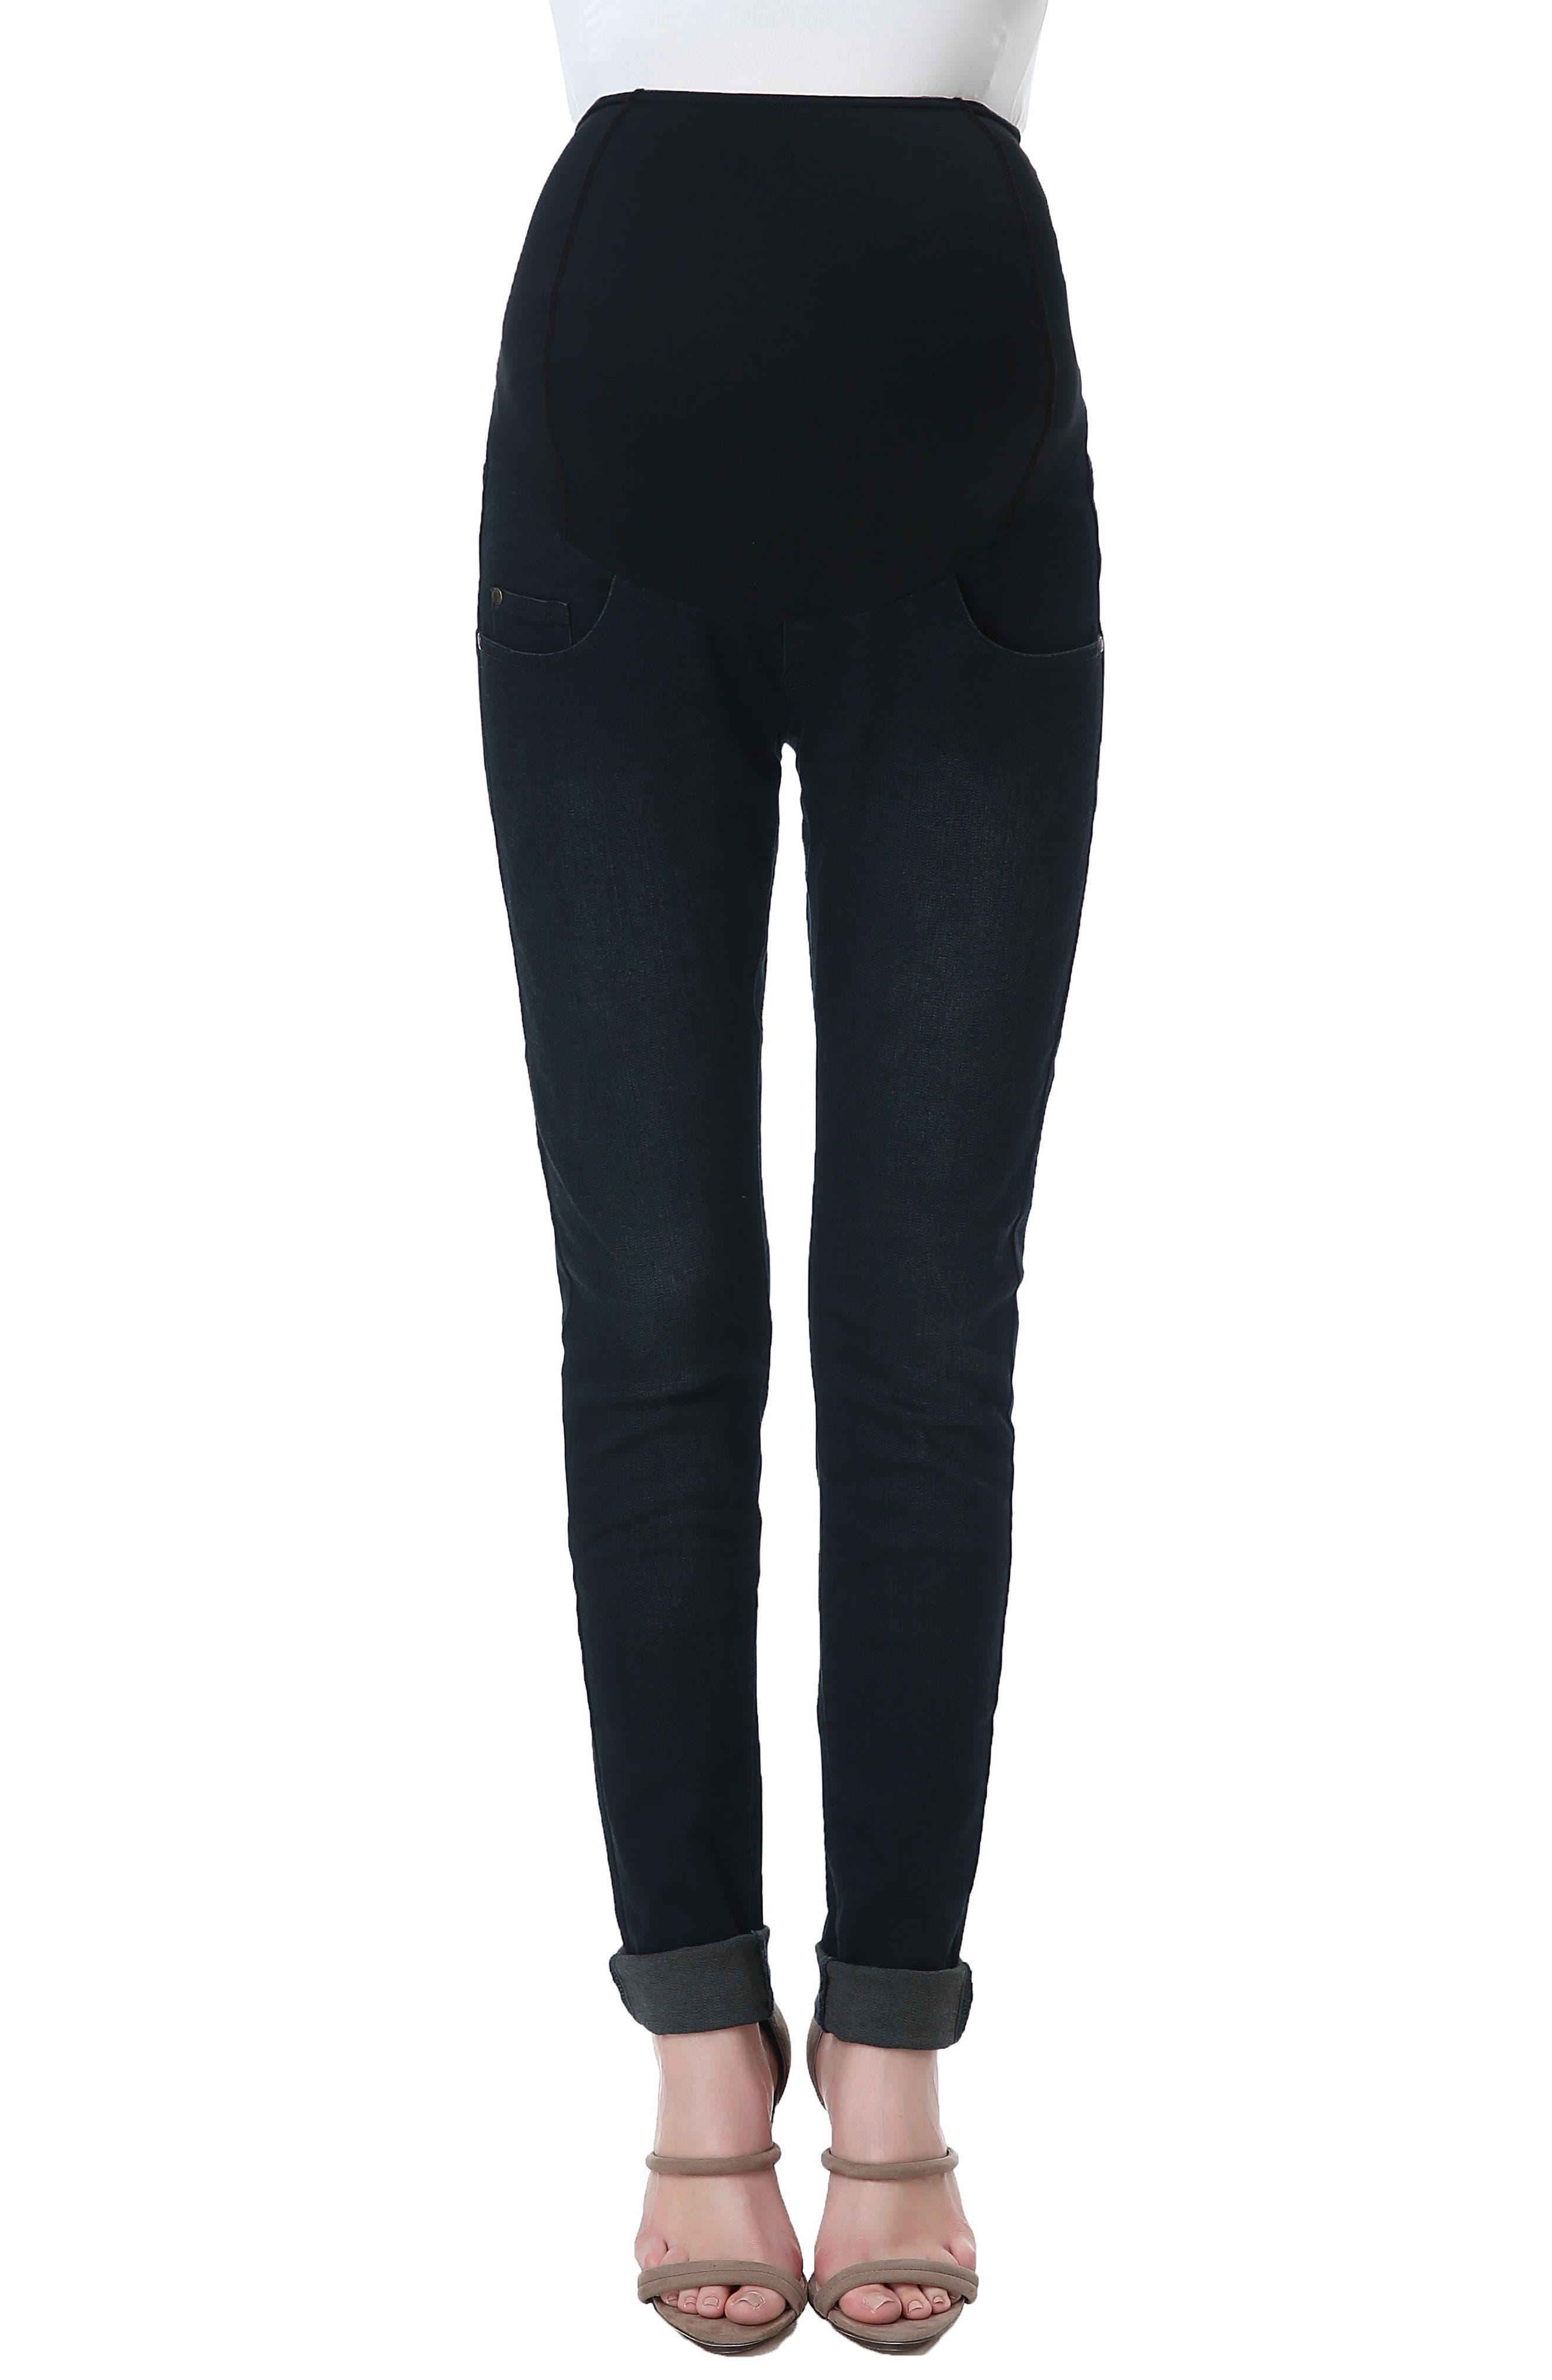 Rae Maternity Skinny Jeans,                         Main,                         color, Black/ Blue